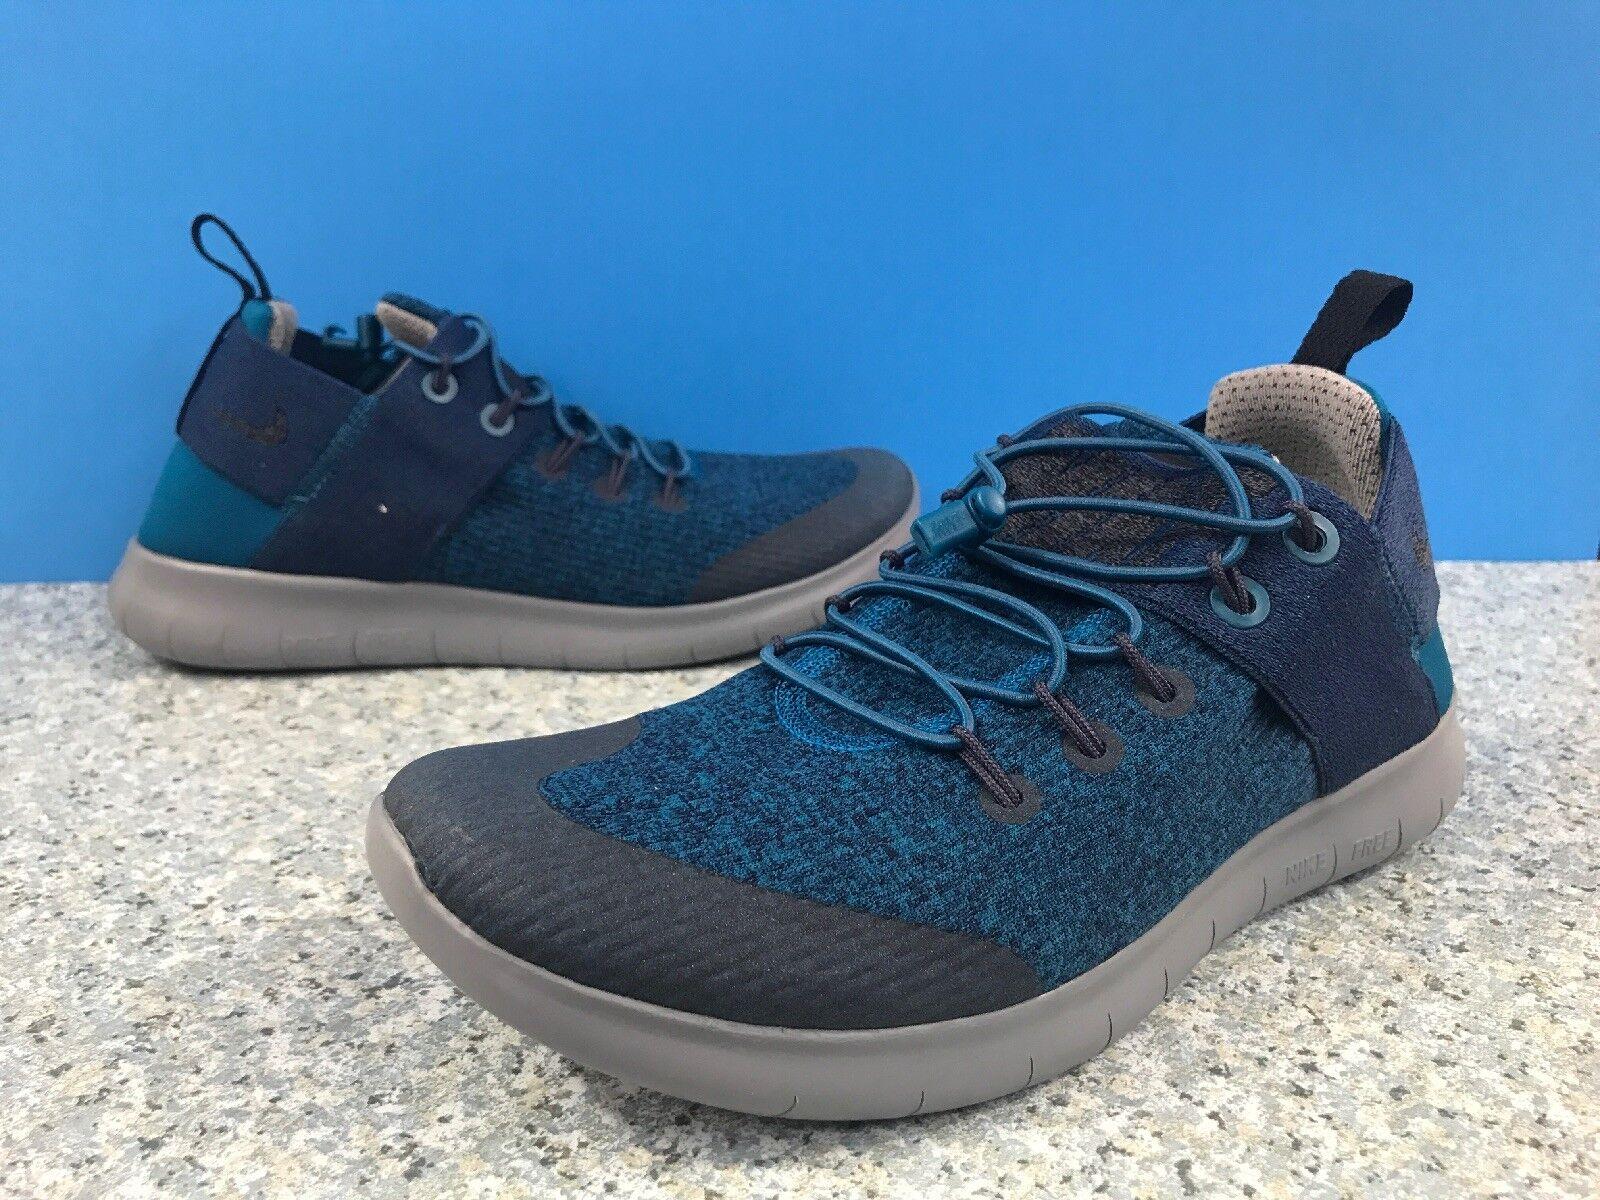 Nike Free RN springa CMTR Commuter 2017 Premium skor AA1622 -300 kvinnor SZ 8